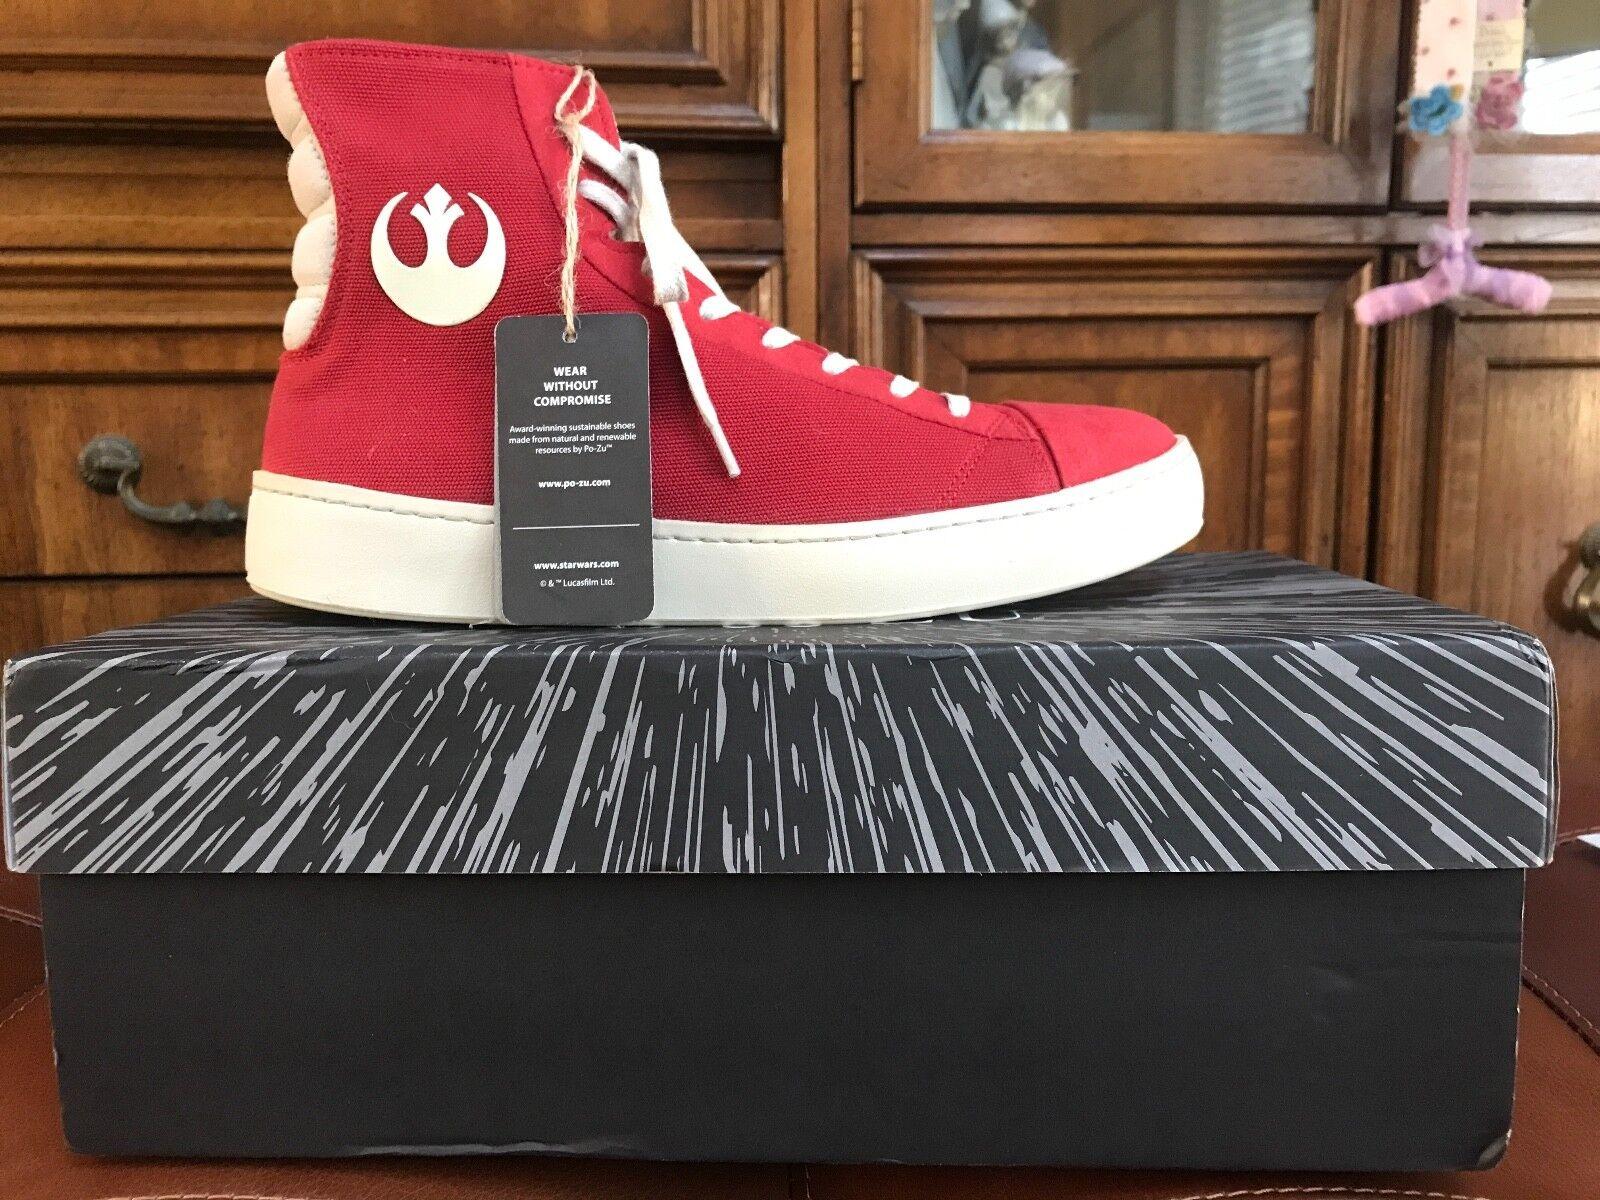 PO-ZU High Star Wars Resistance Rosso High PO-ZU Tops - Poe Dameron Scarpe da Ginnastica Size 41 8d9351